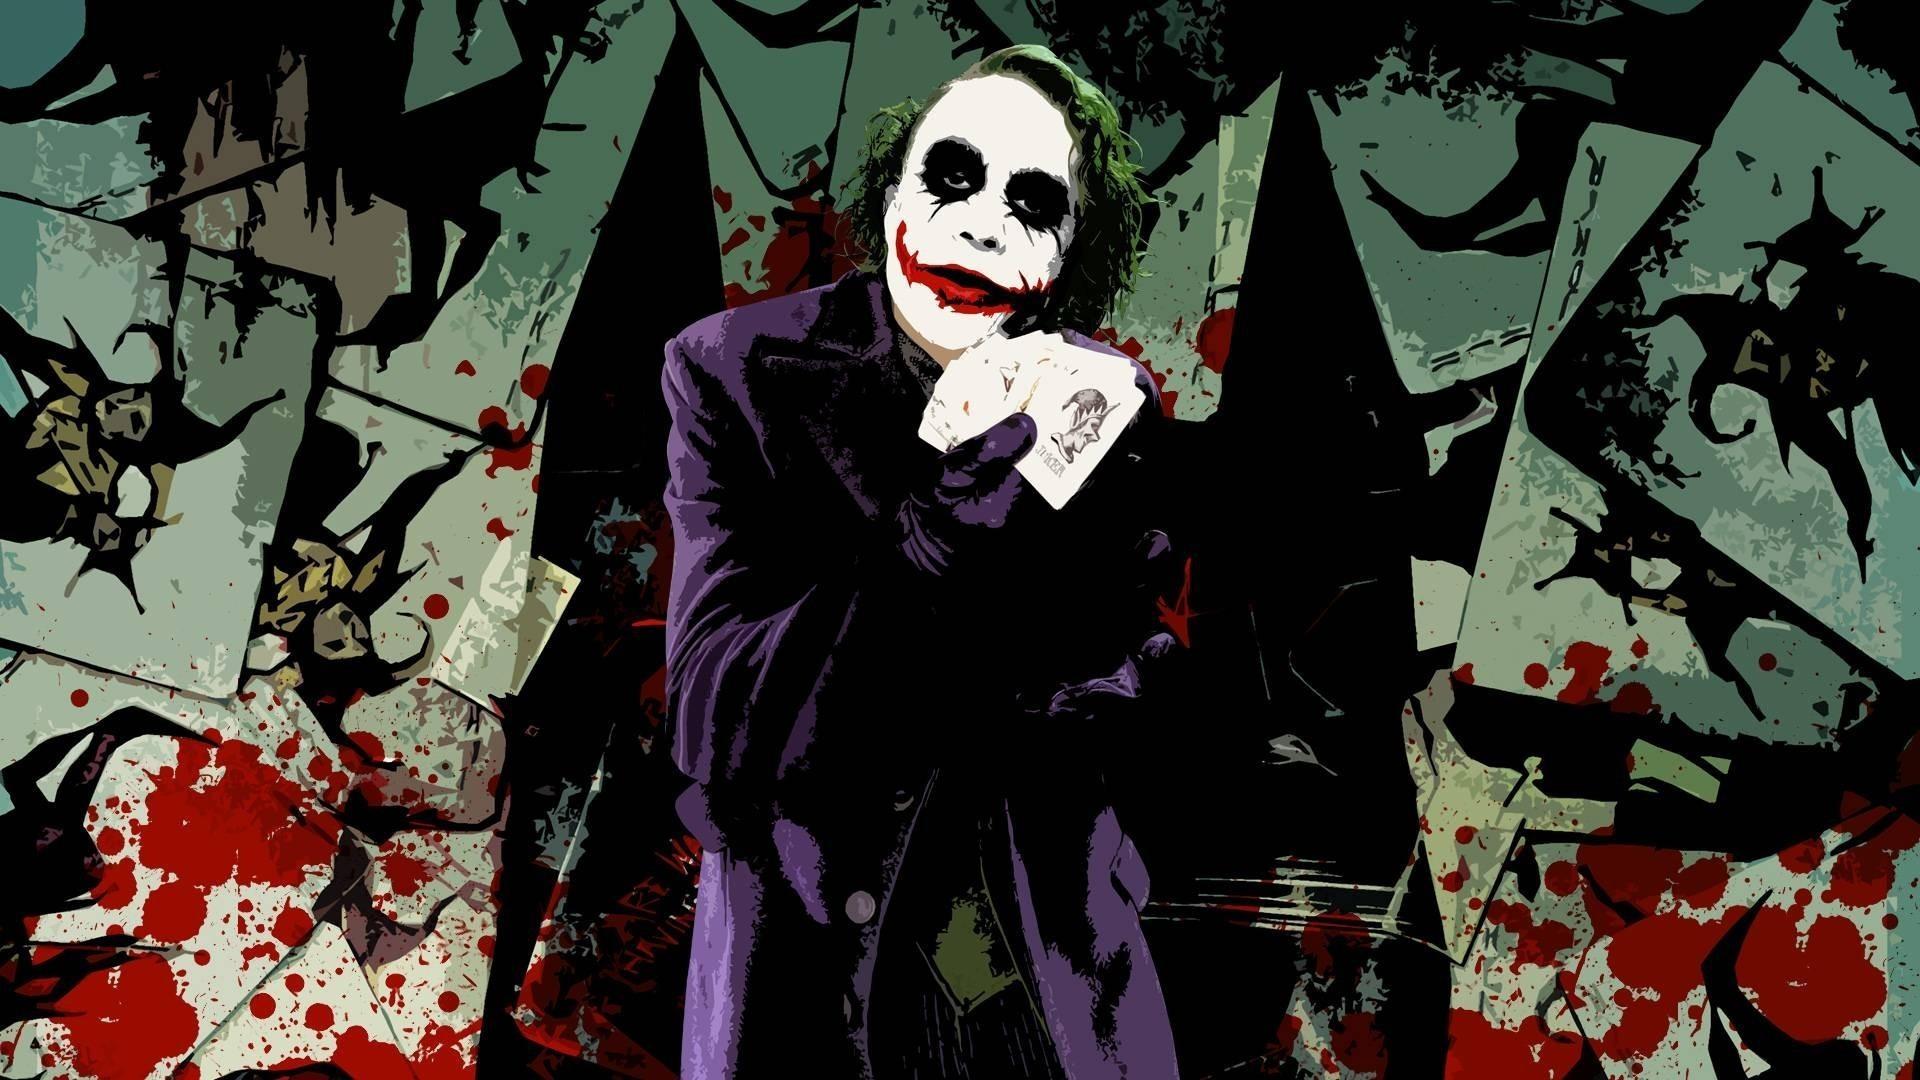 1920x1200 Memes For Joker Why So Serious Wallpaper Hd 1080p